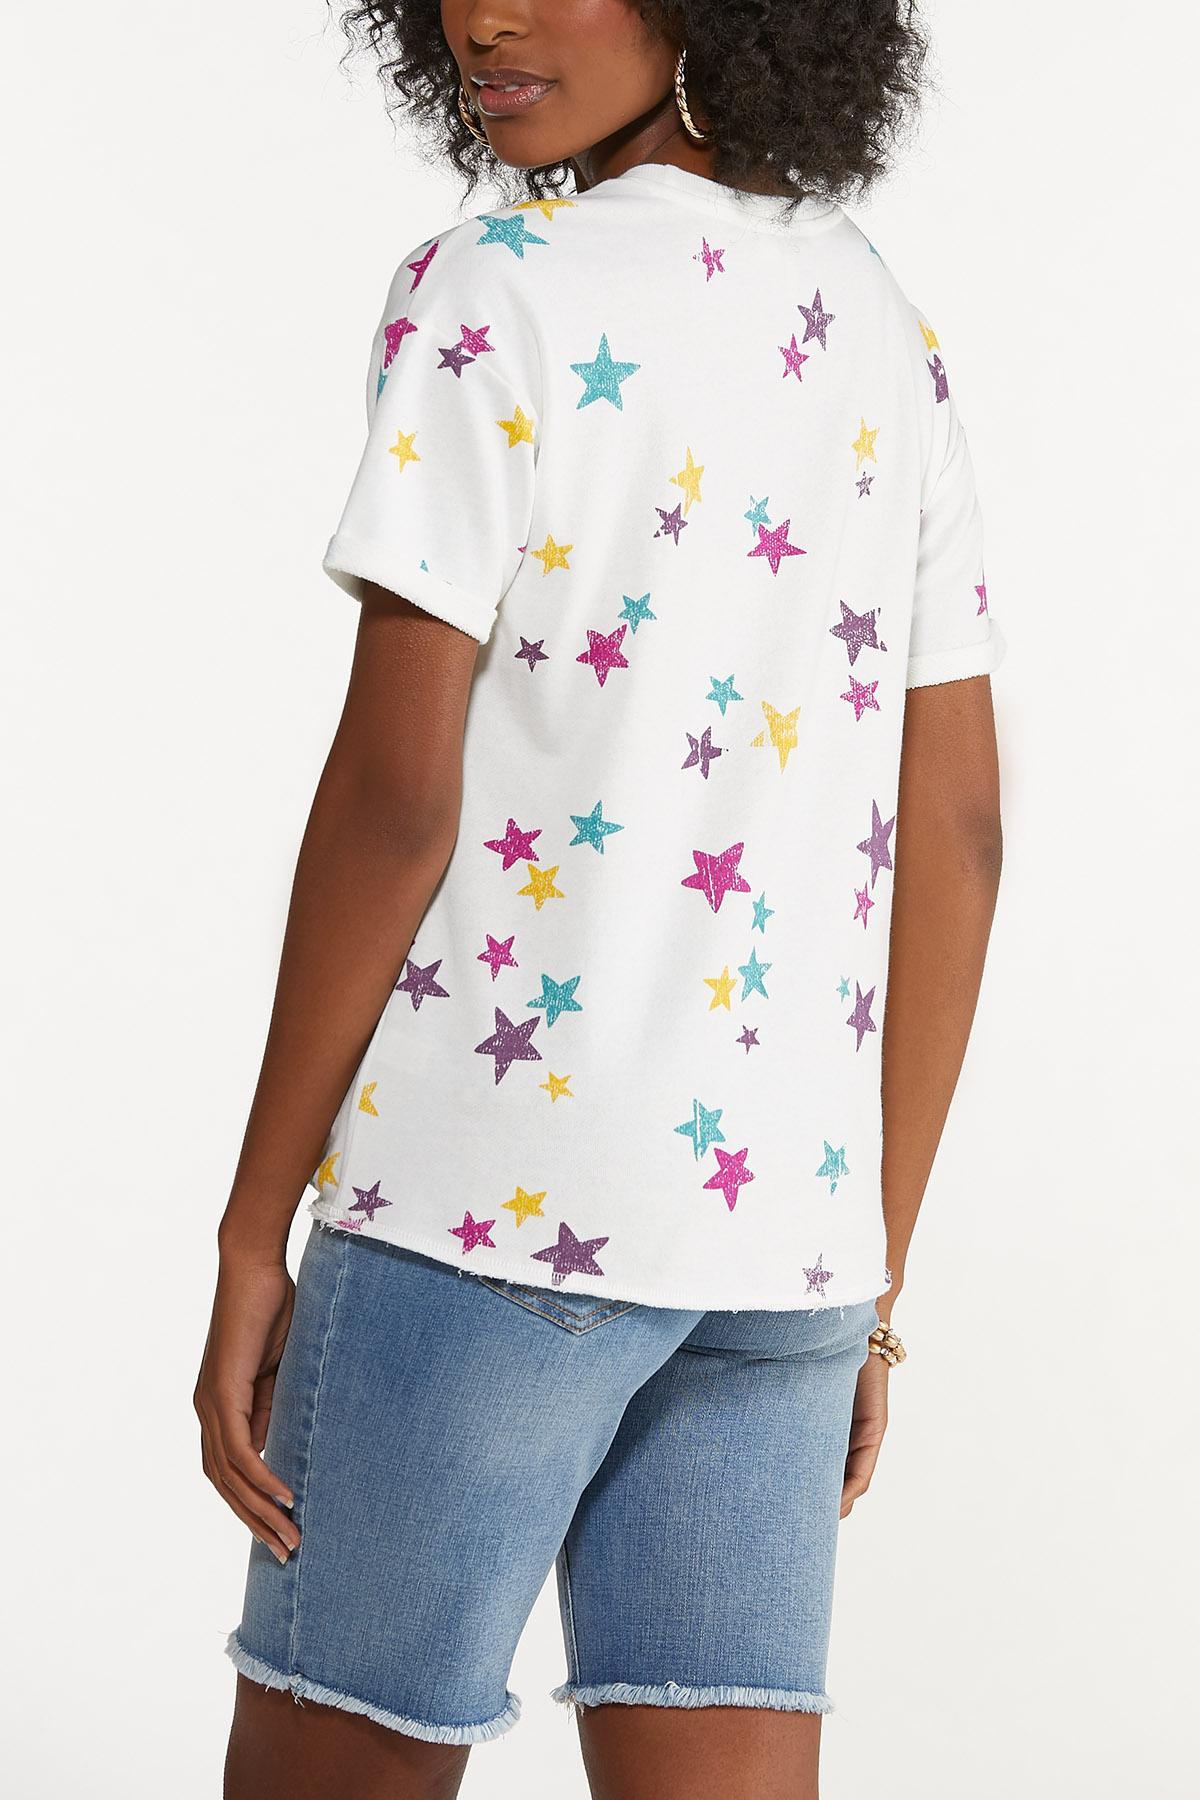 Knotted Star Sweatshirt (Item #44680949)